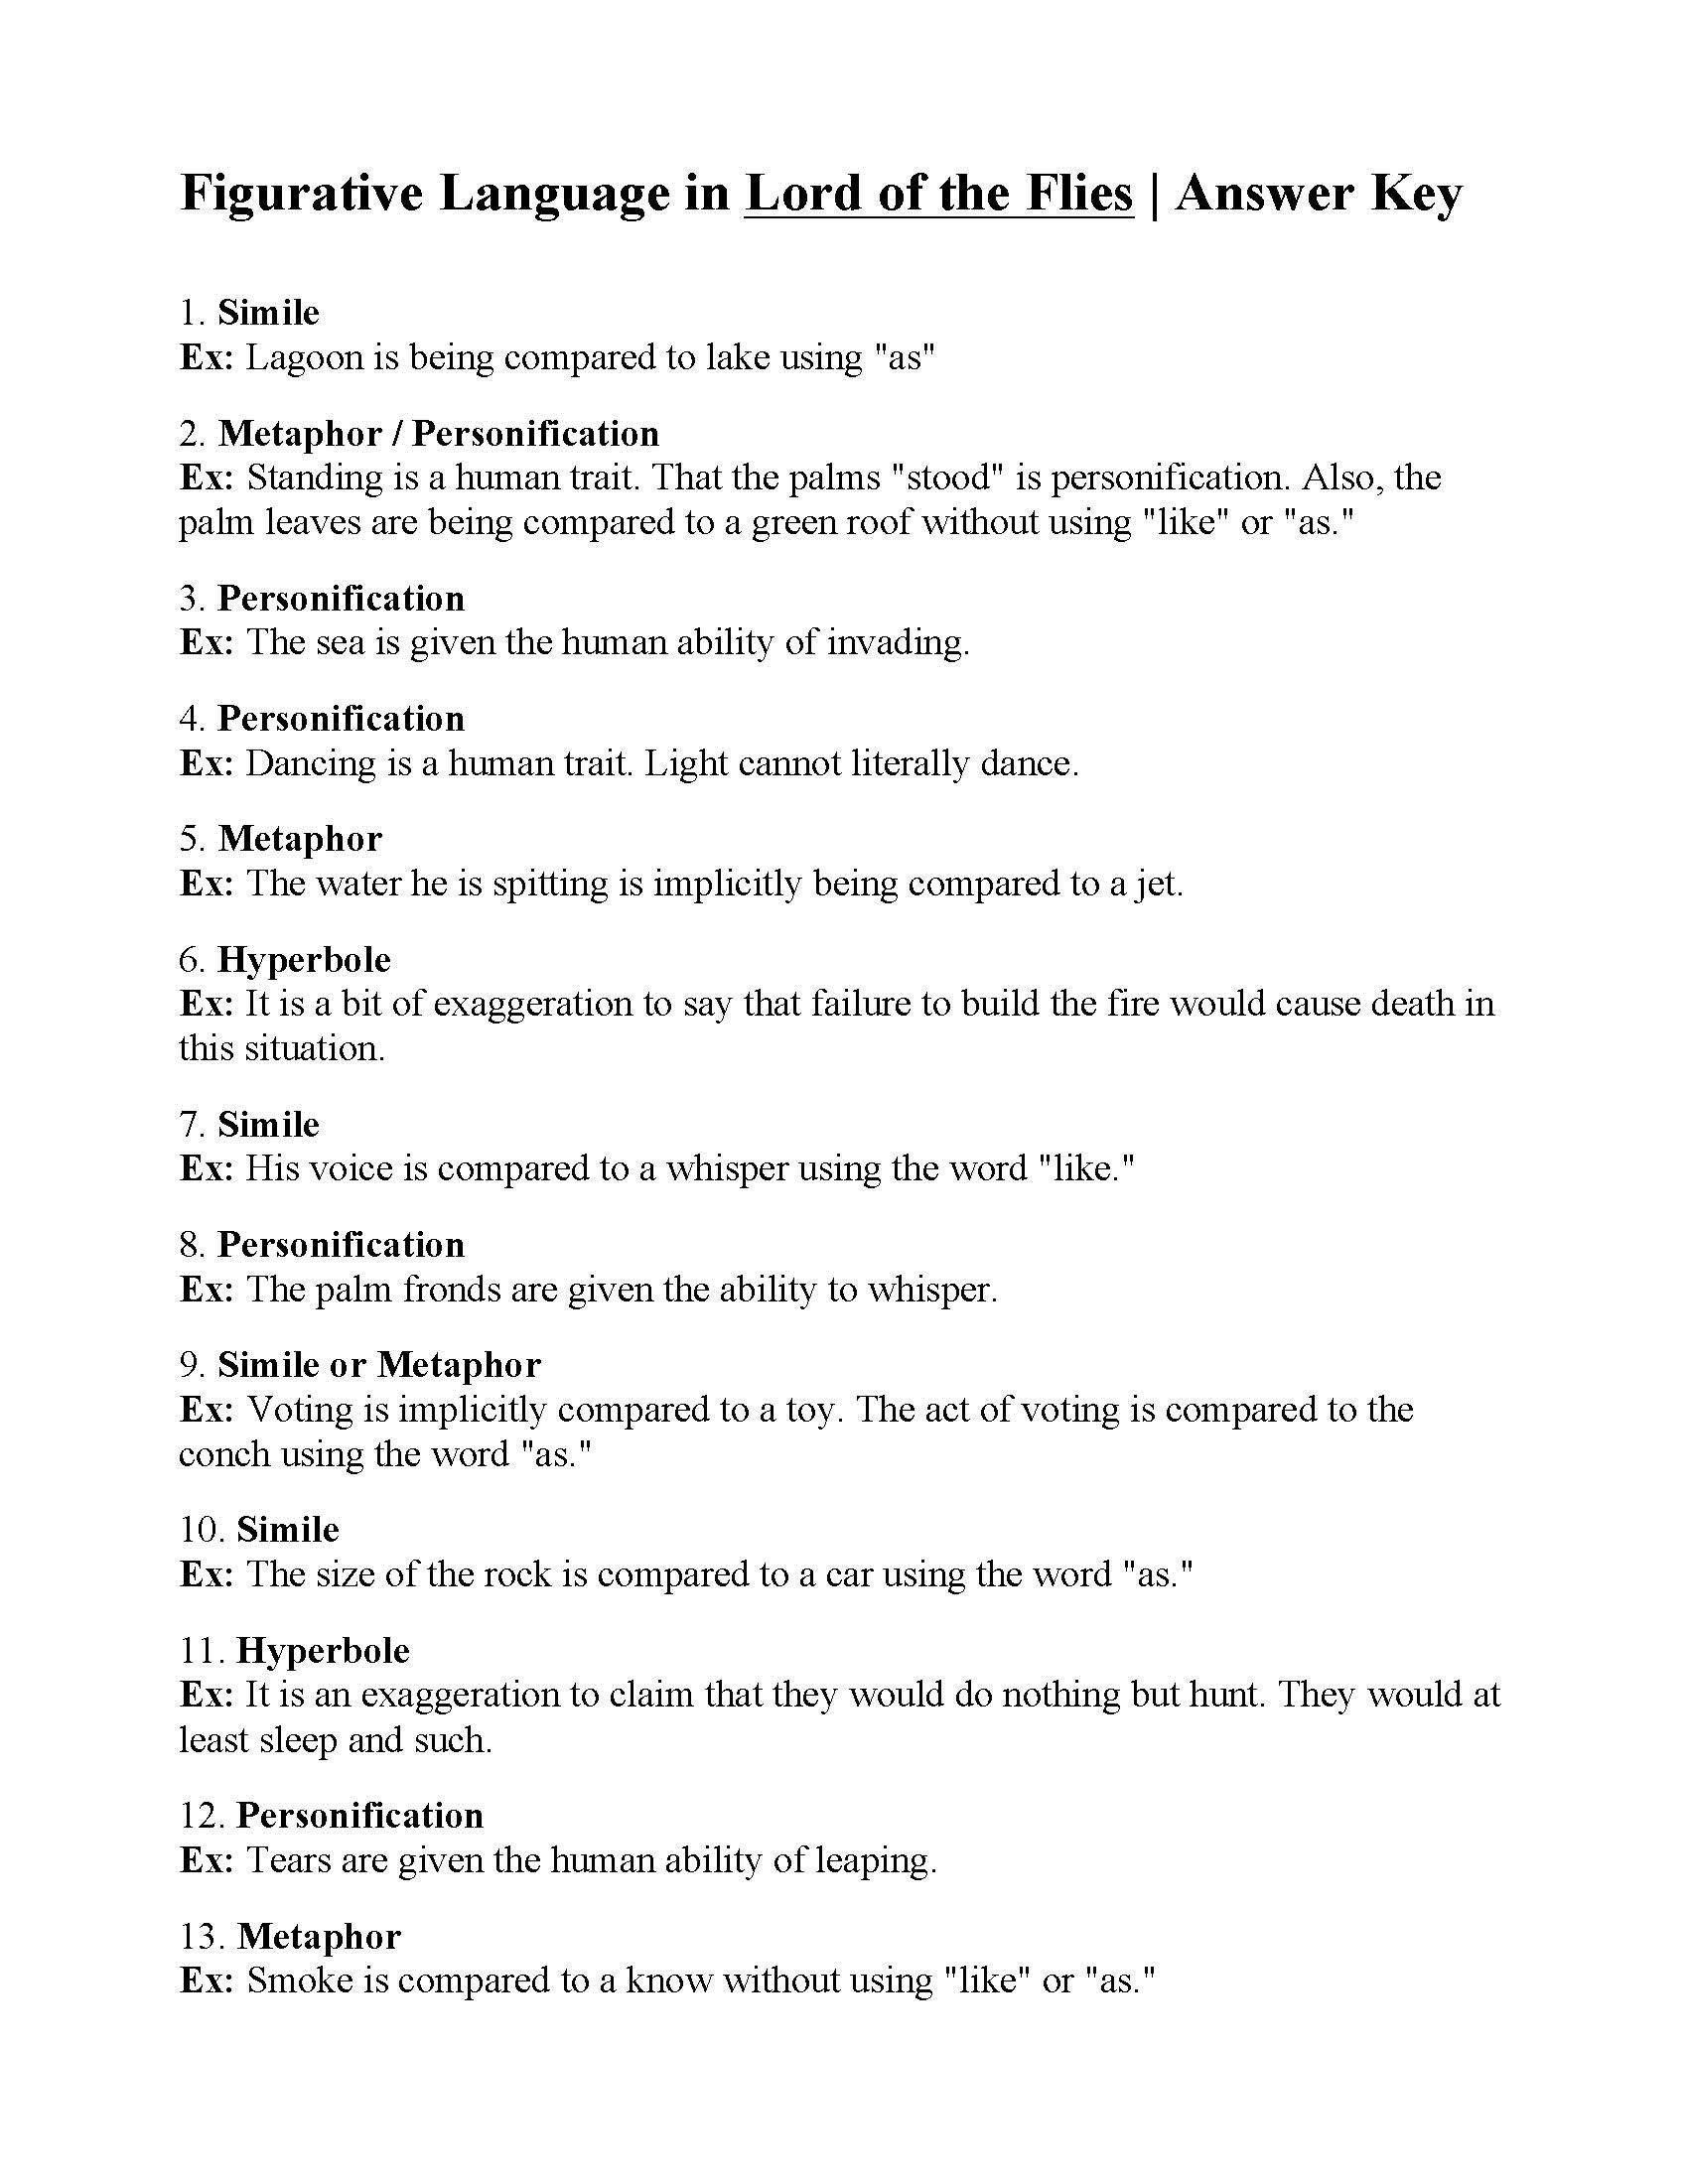 20 Figurative Language Worksheet High School Worksheet From Home Languagearts Figur In 2020 Figurative Language Worksheet Language Worksheets Figurative Language